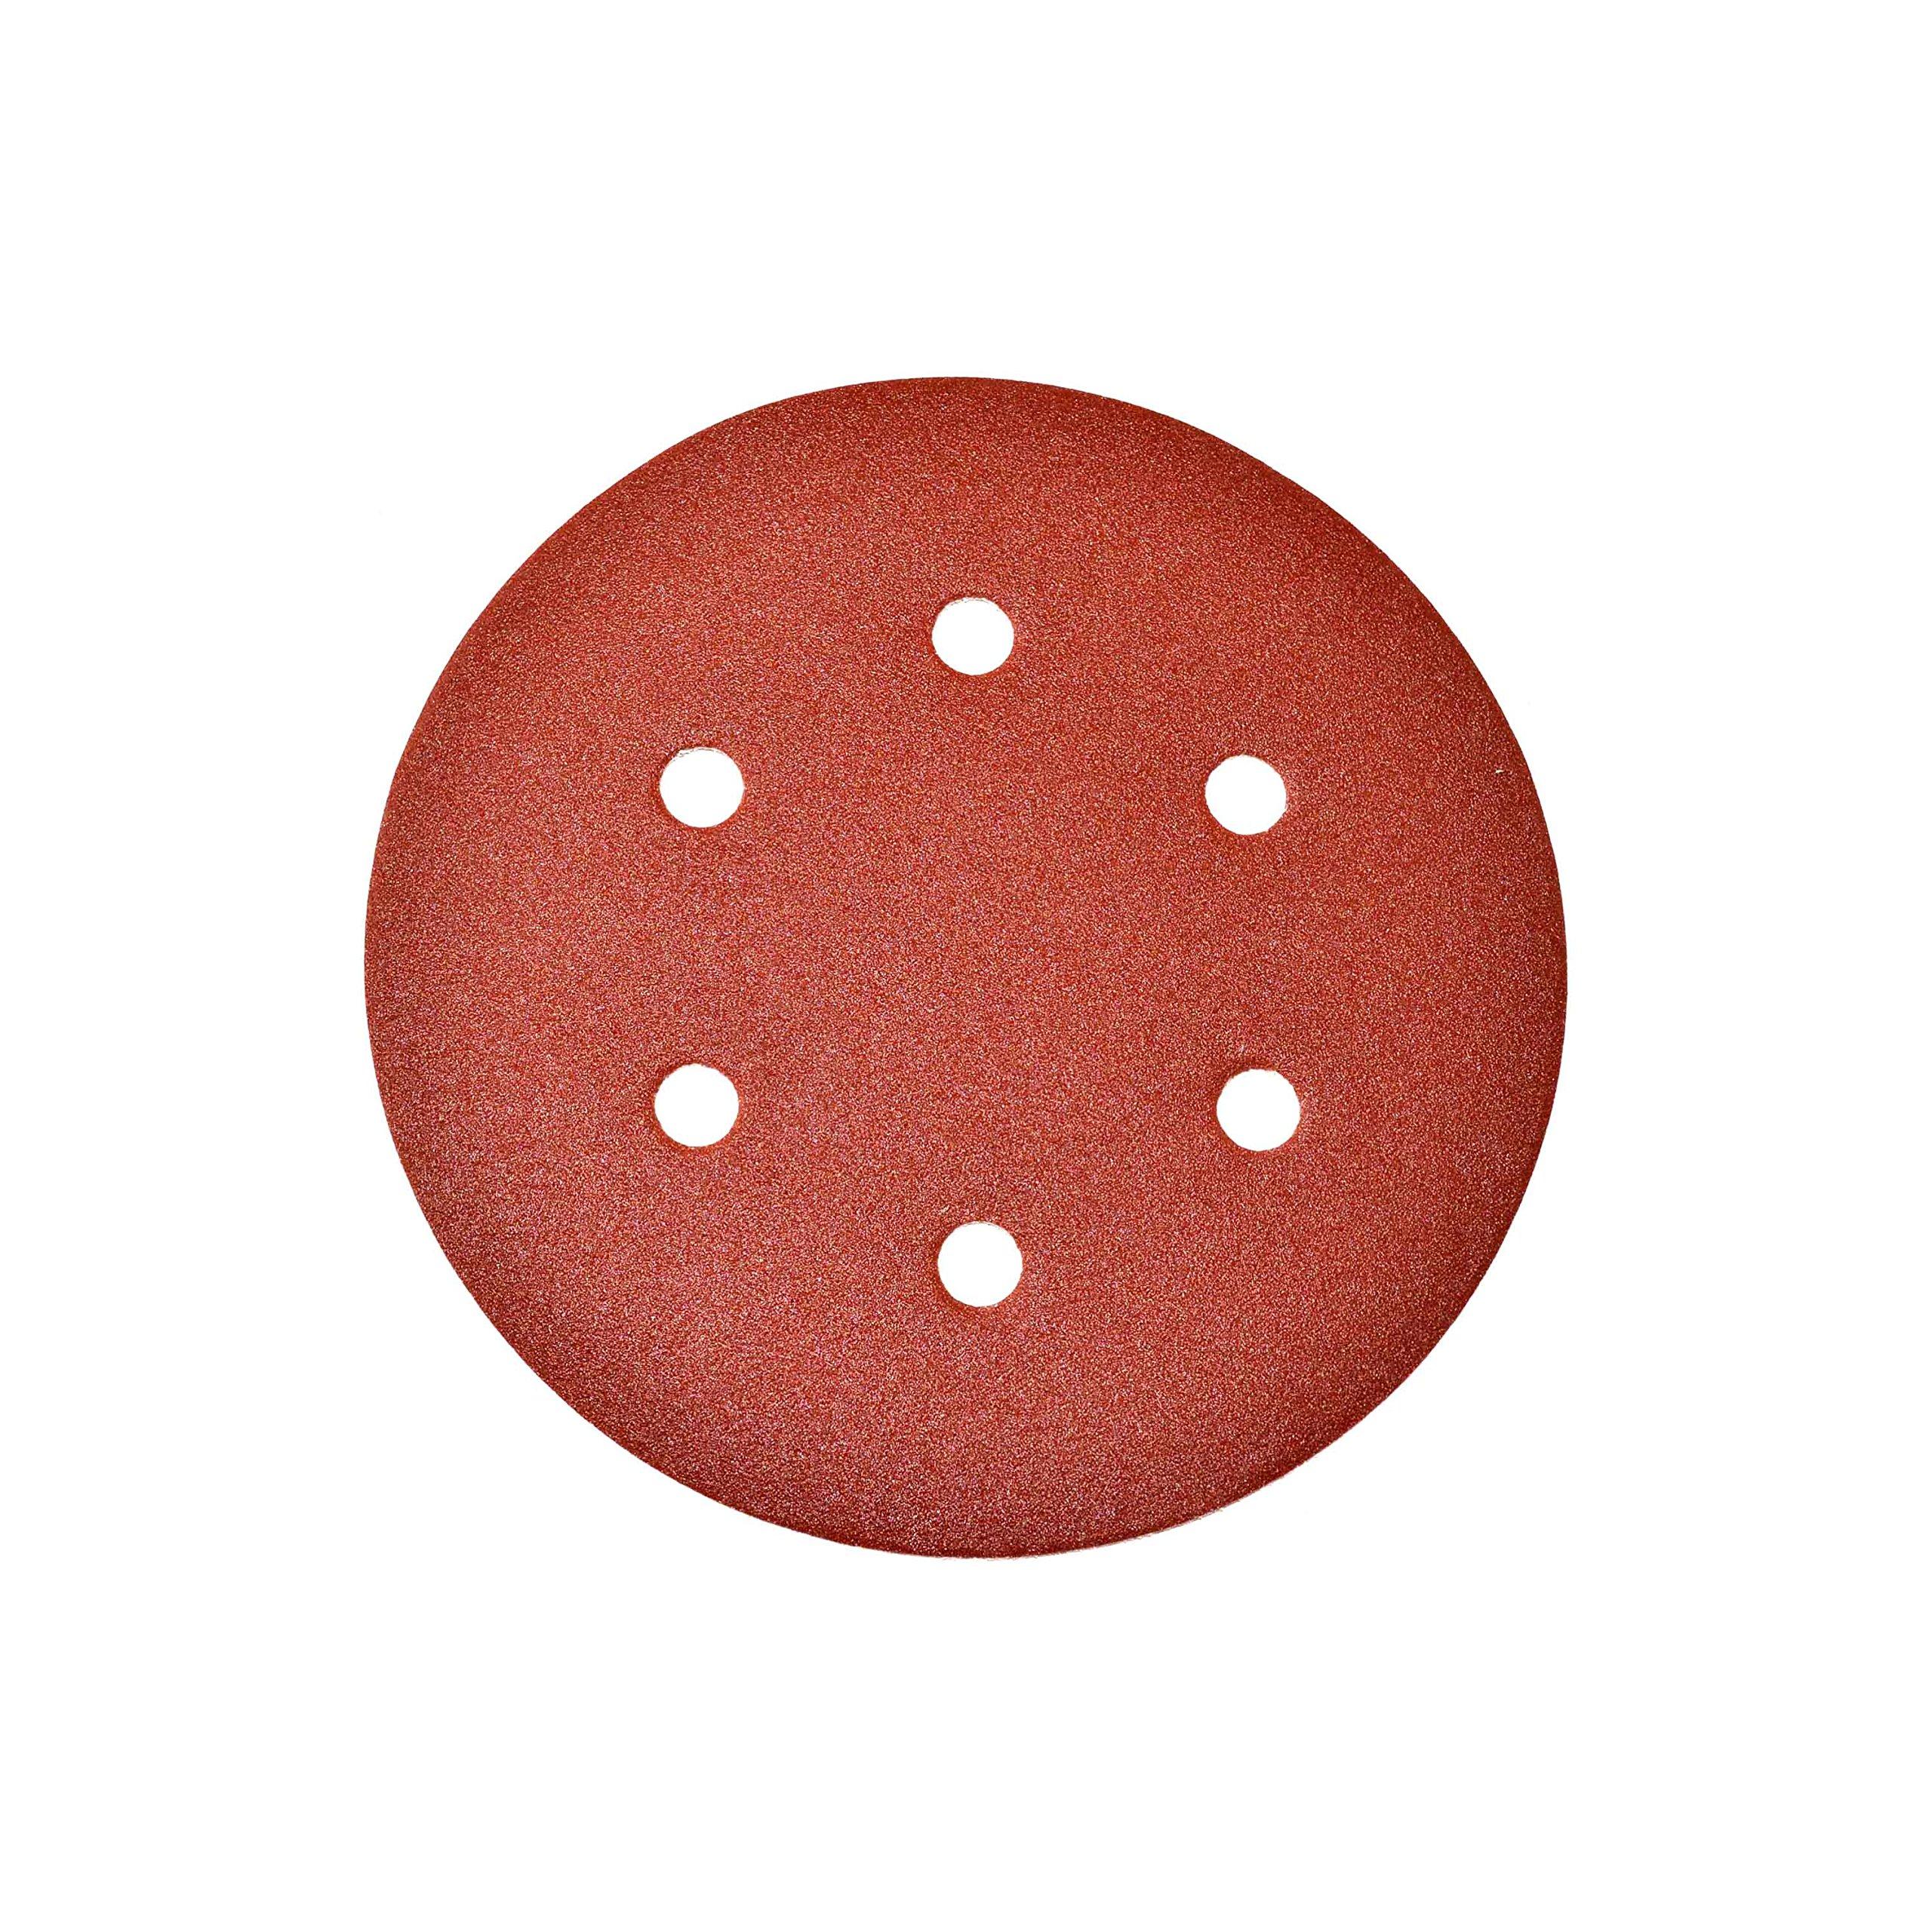 ALEKO 14SD04-10-180G 6 Inch 6 Hole 180 Grit Sanding Discs Sandpaper for Drywall Sander 10 Pack